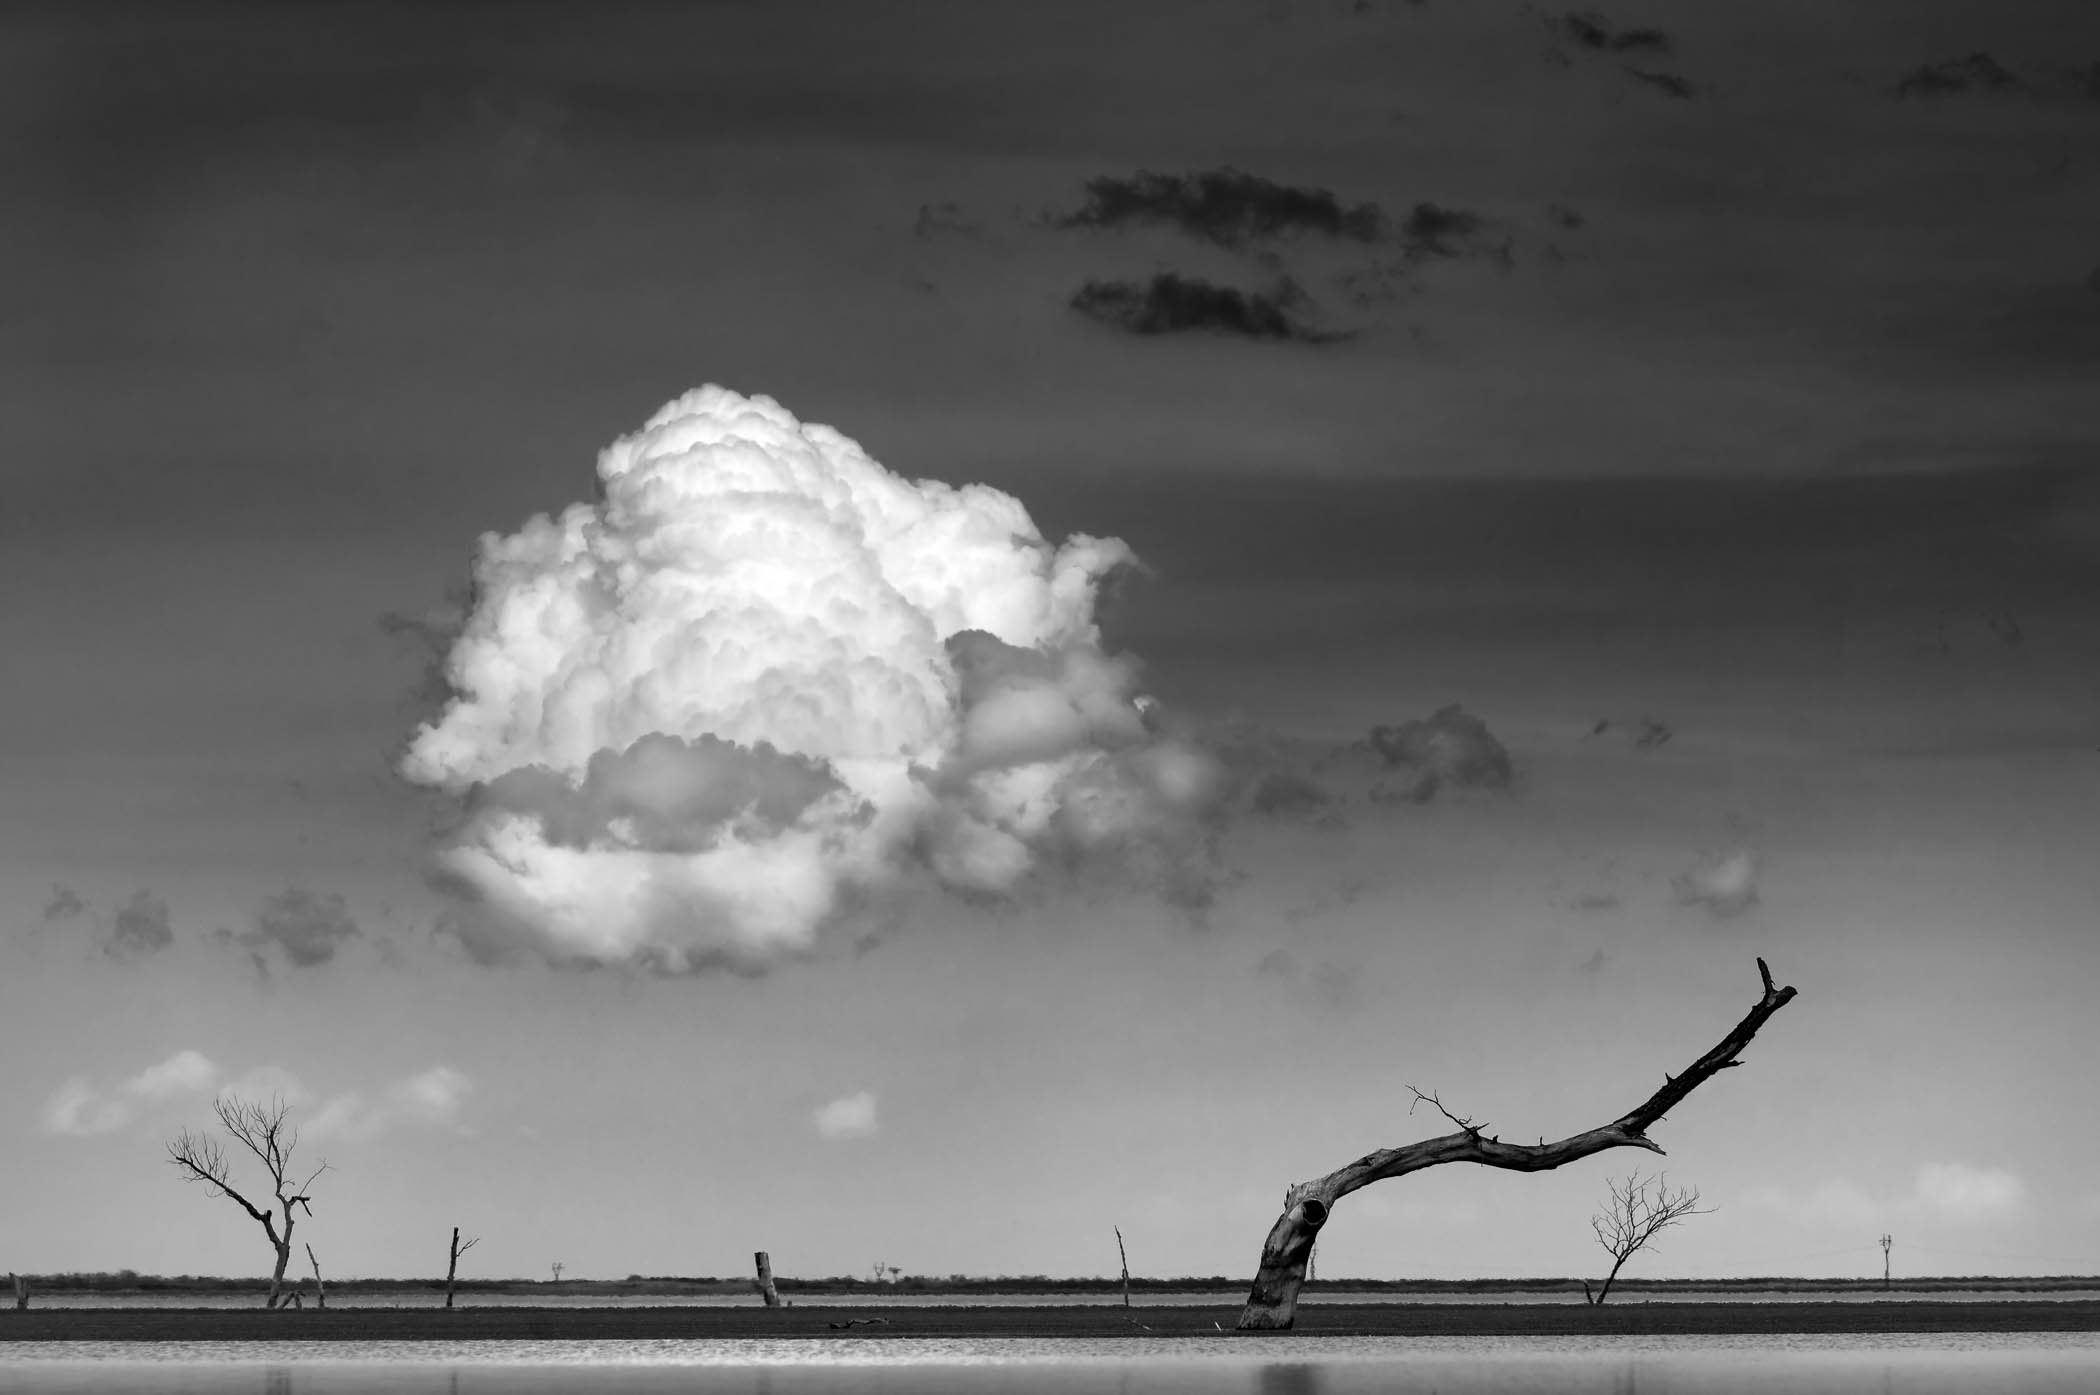 Swatting the Cloud, North Dakota